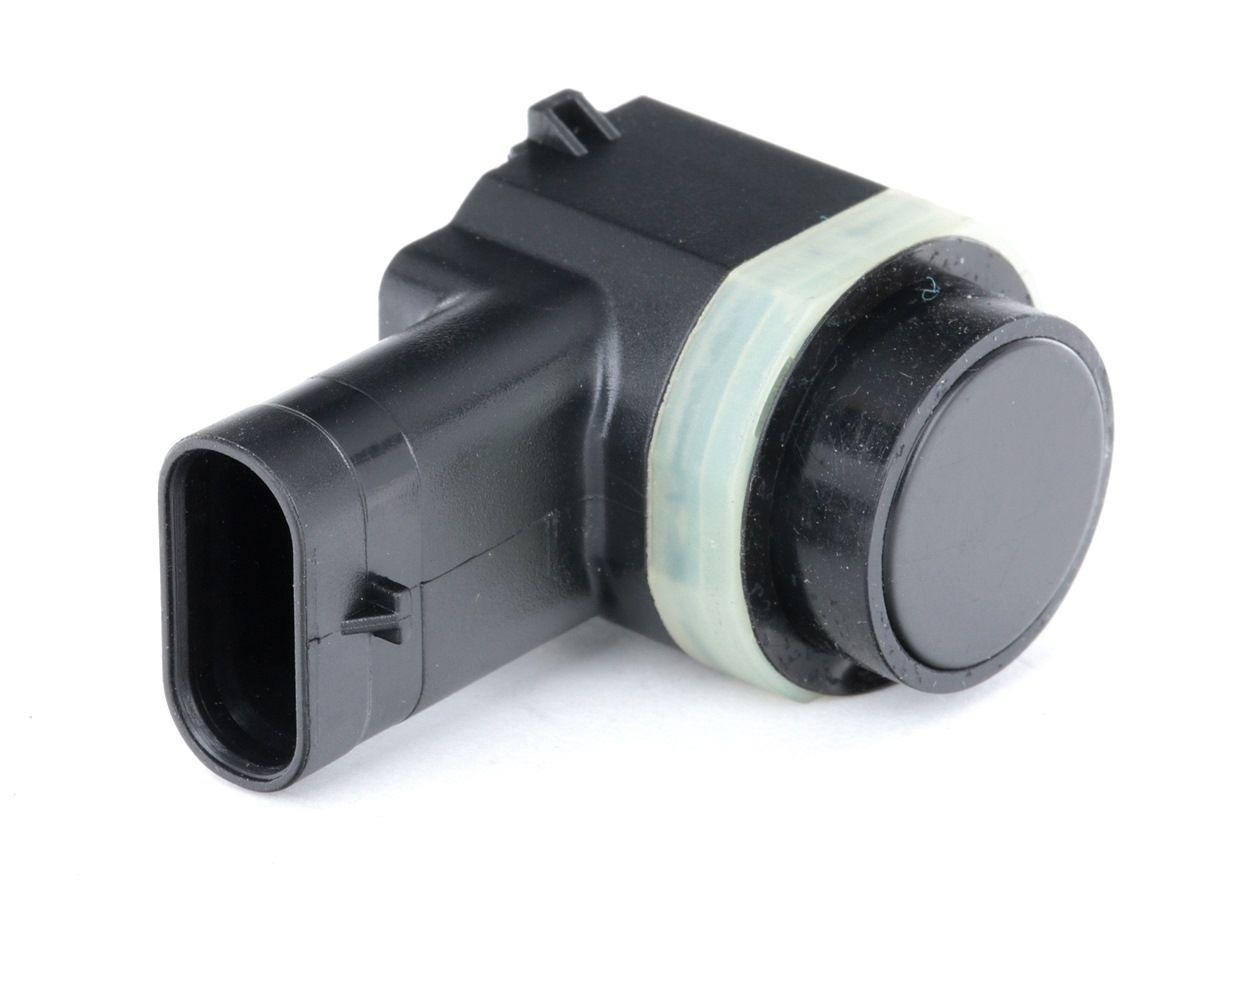 ridex Parkeersensoren LAND ROVER 2412P0043 LR010927,LR038084 Achteruitrijsensoren,Parkeerhulp,Sensor, park distance control